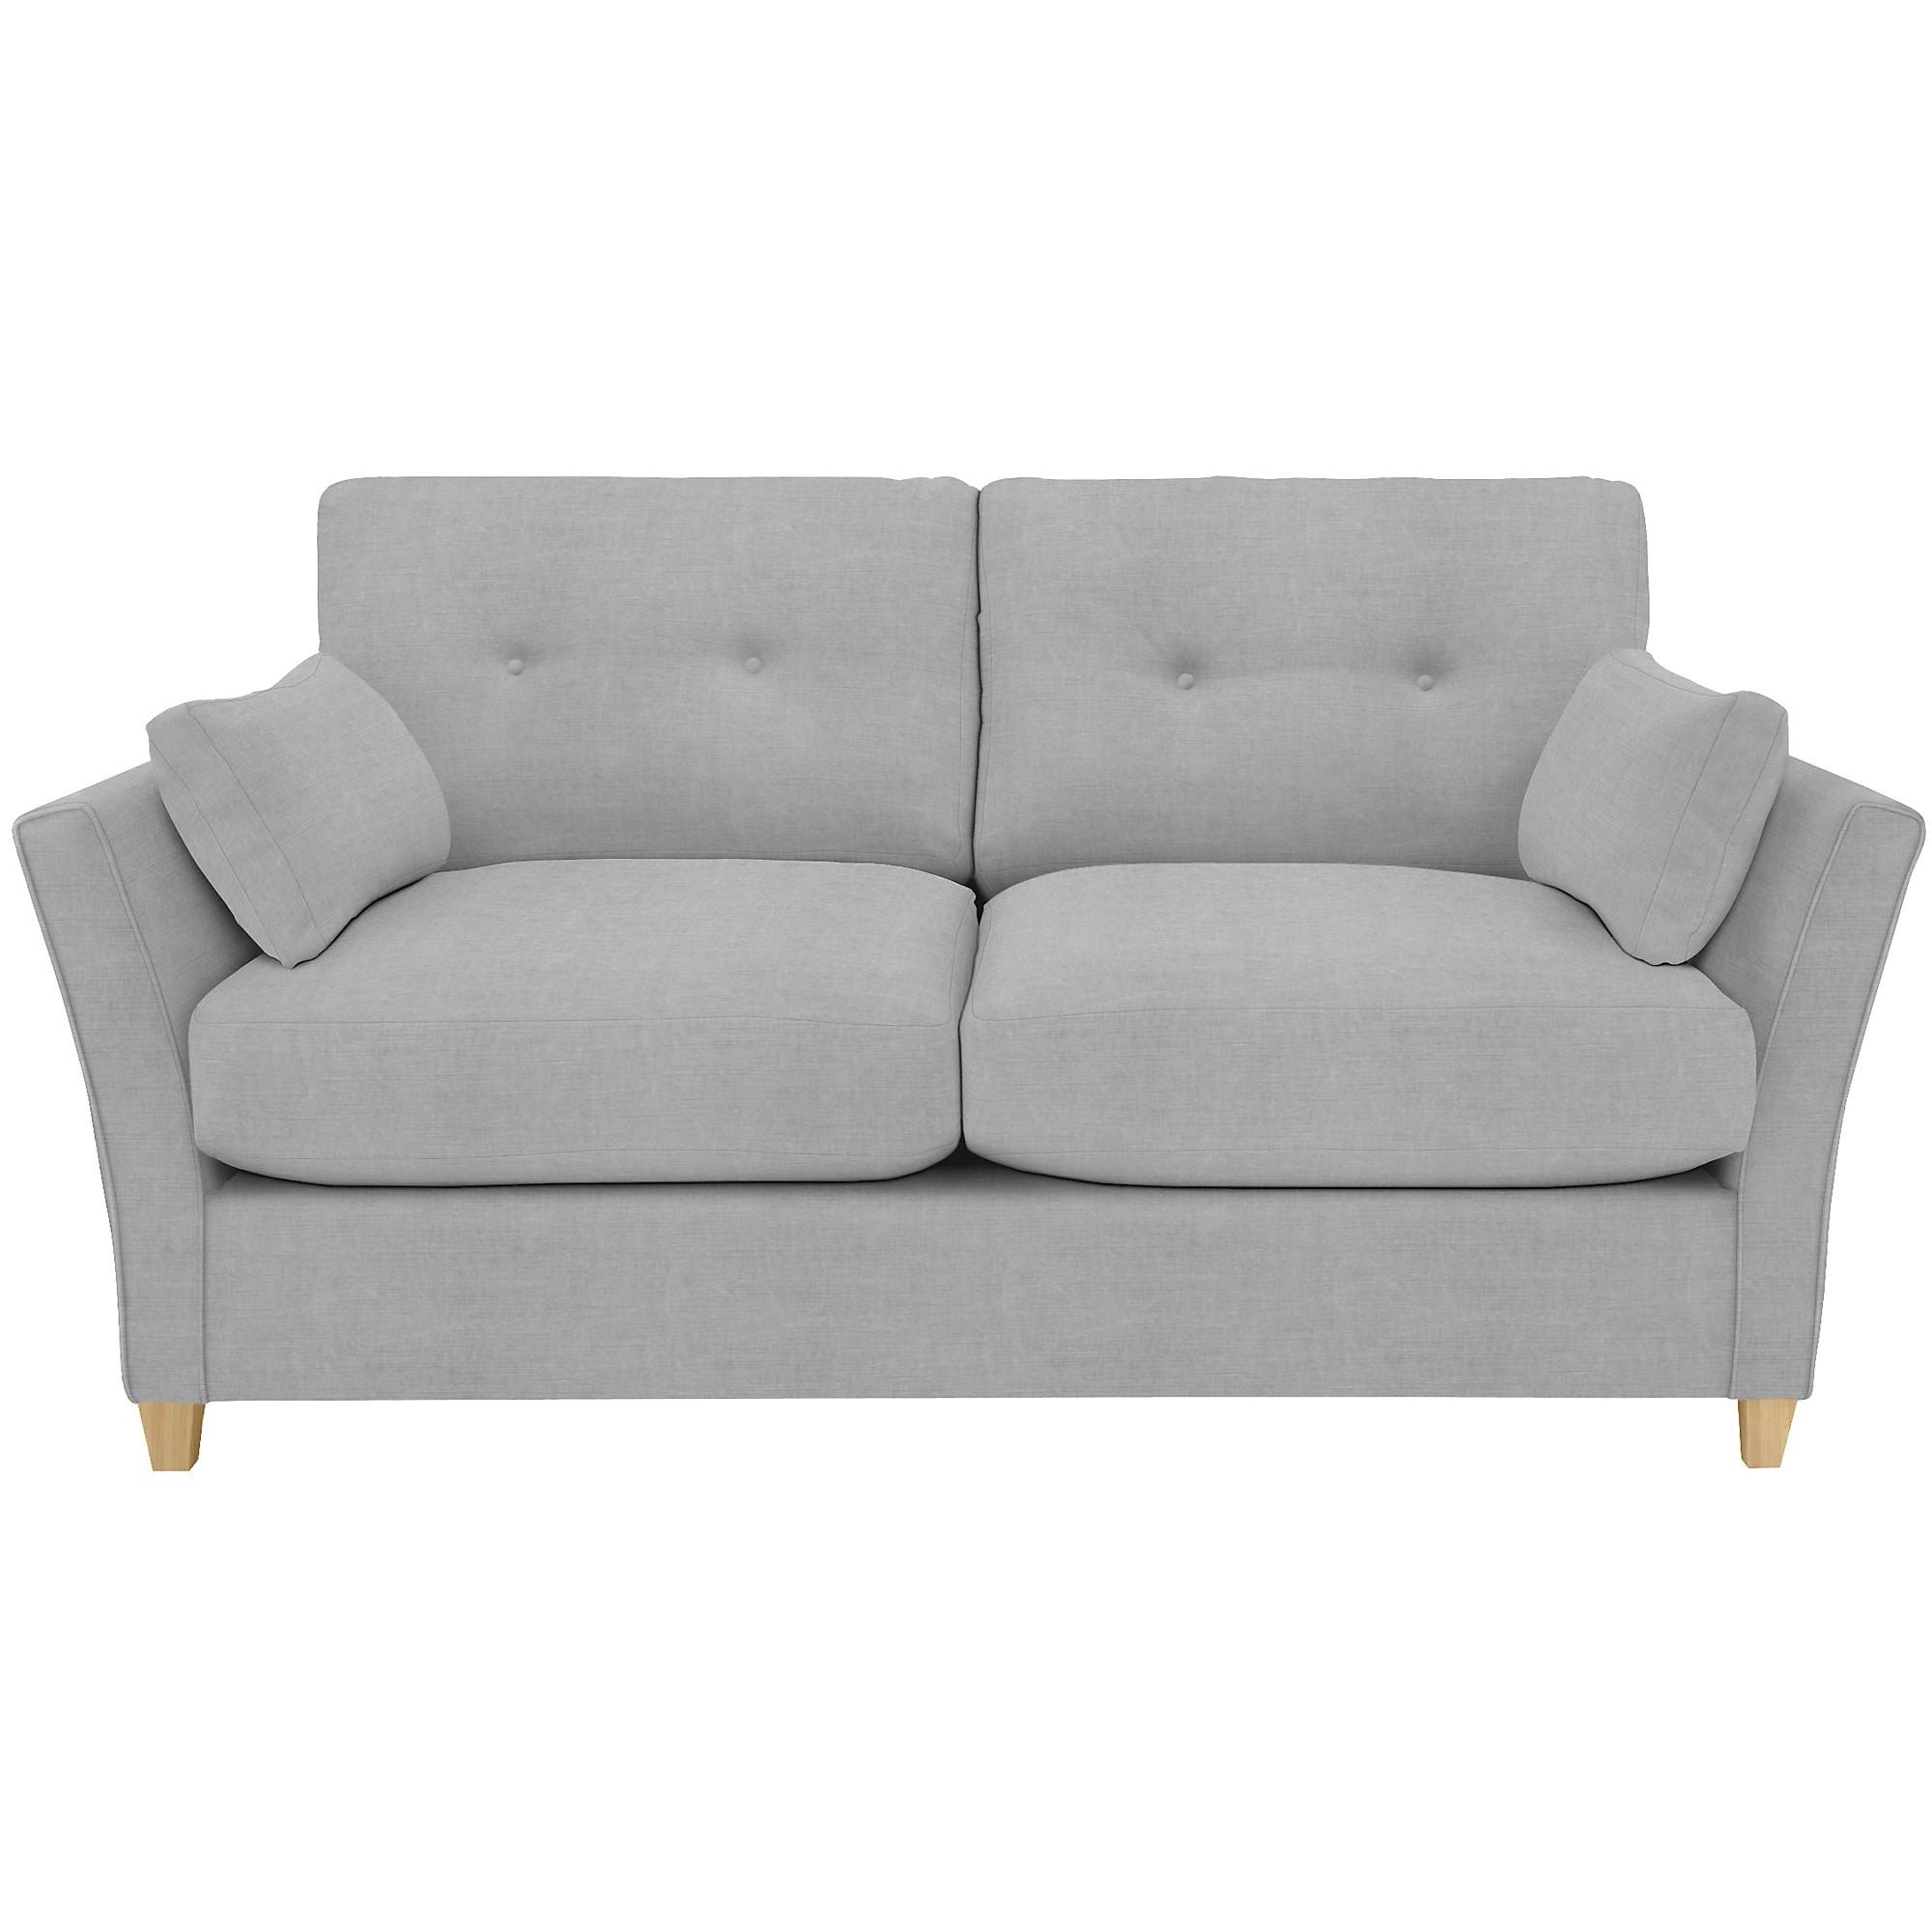 john lewis chopin medium sofa review best buy review. Black Bedroom Furniture Sets. Home Design Ideas